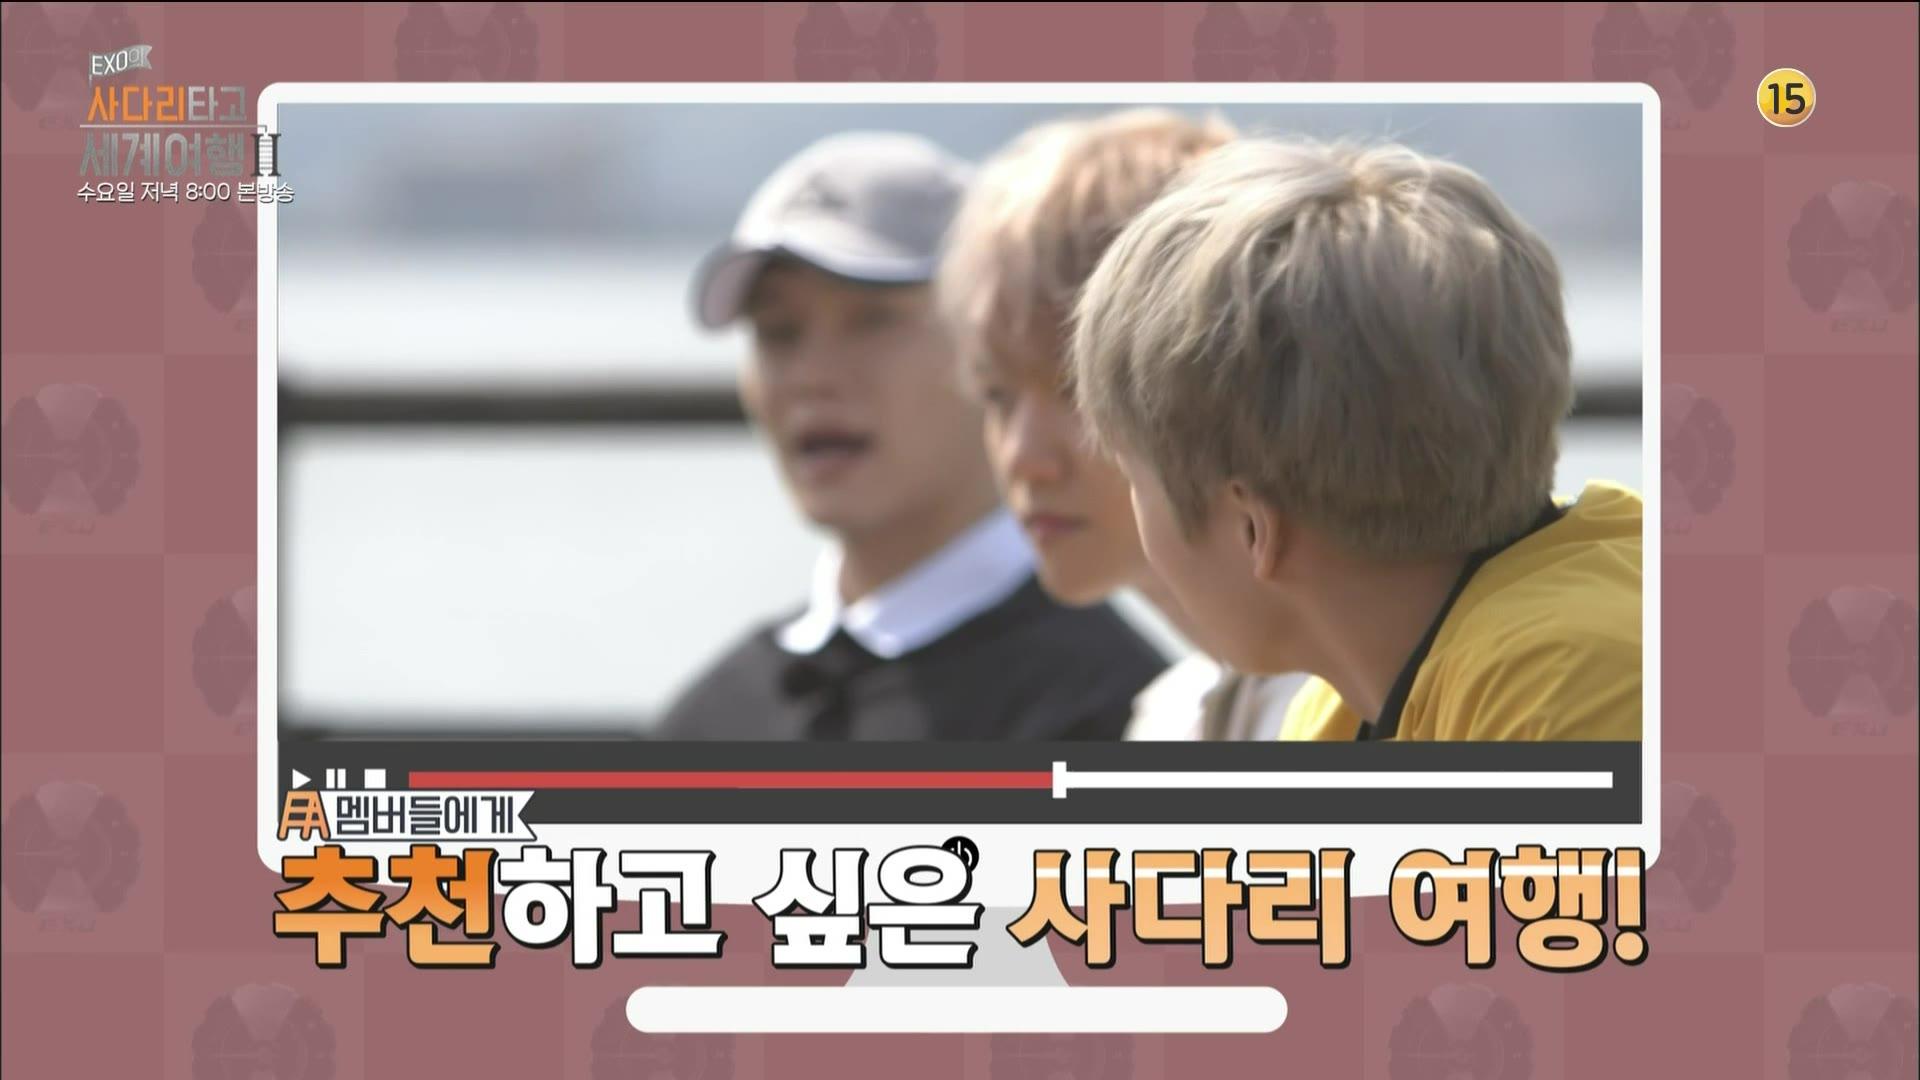 【EXO】《EXO的爬梯子世界旅行》高雄墾丁篇 XTVN EP.1 1080P 無字幕_嗶哩嗶哩 (゜-゜)つロ 干杯~-bilibili